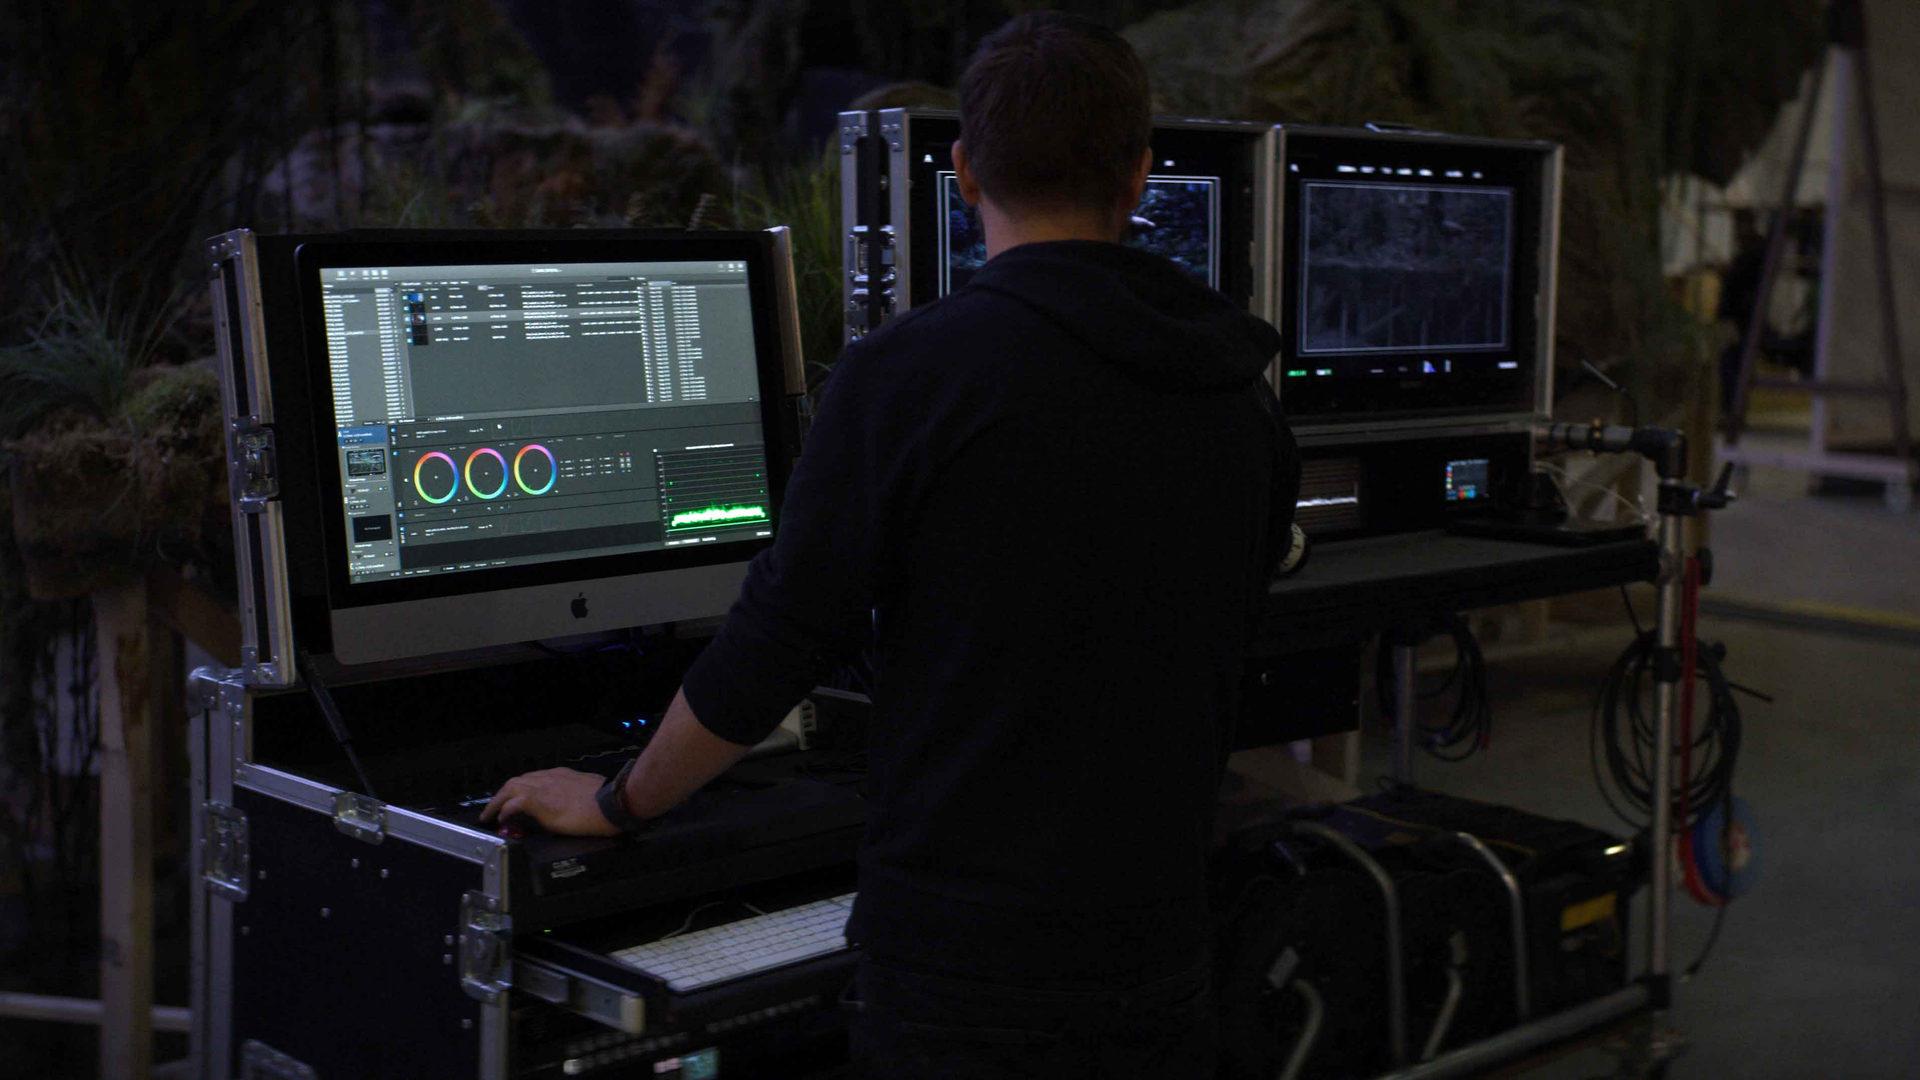 Digital Imaging Technician